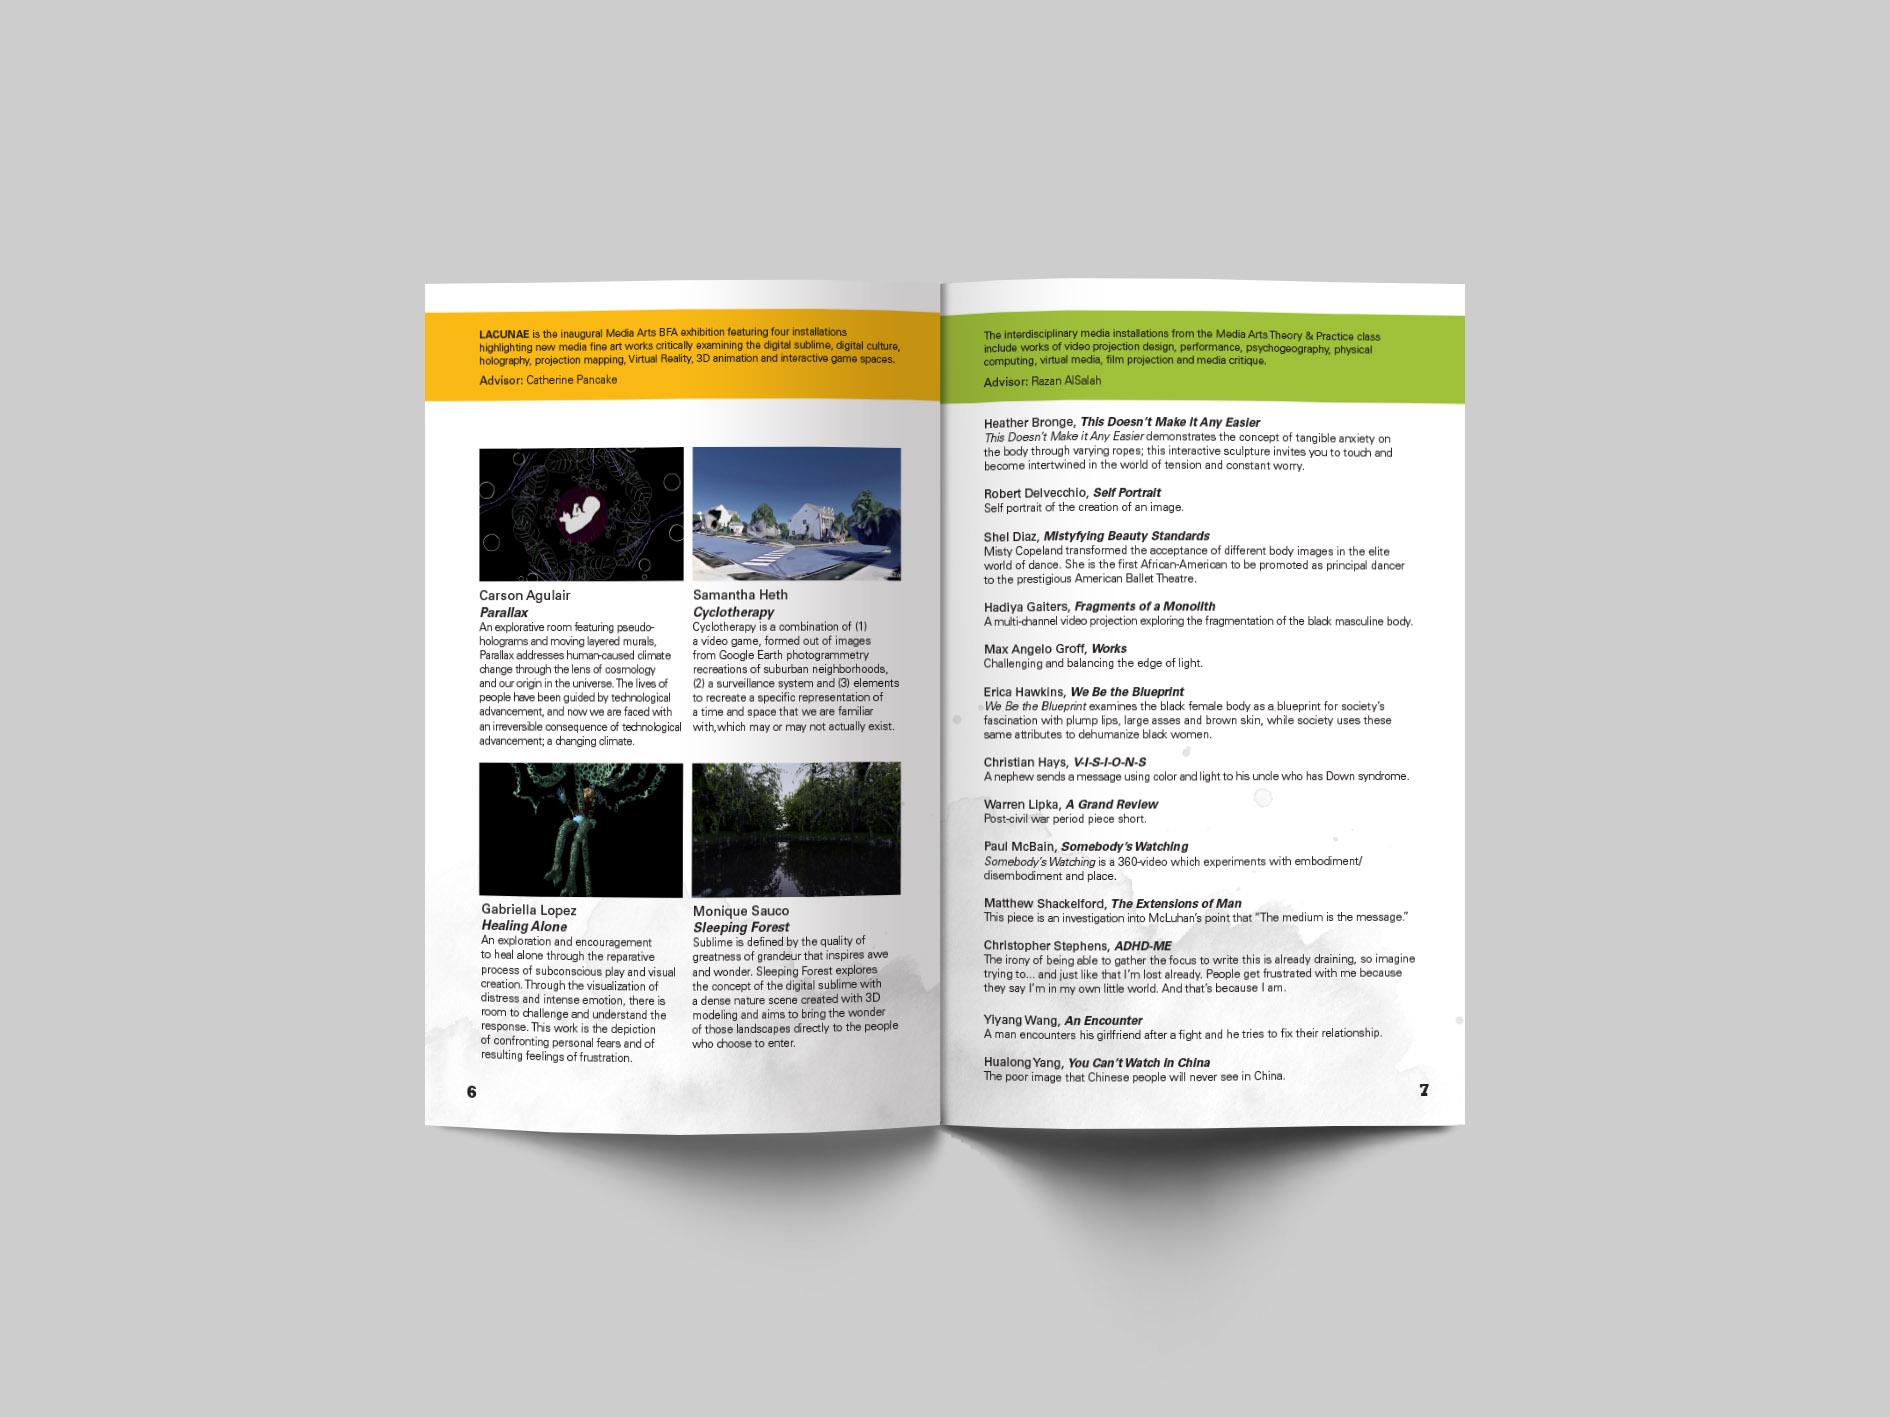 DSFS_book_spread3.jpg